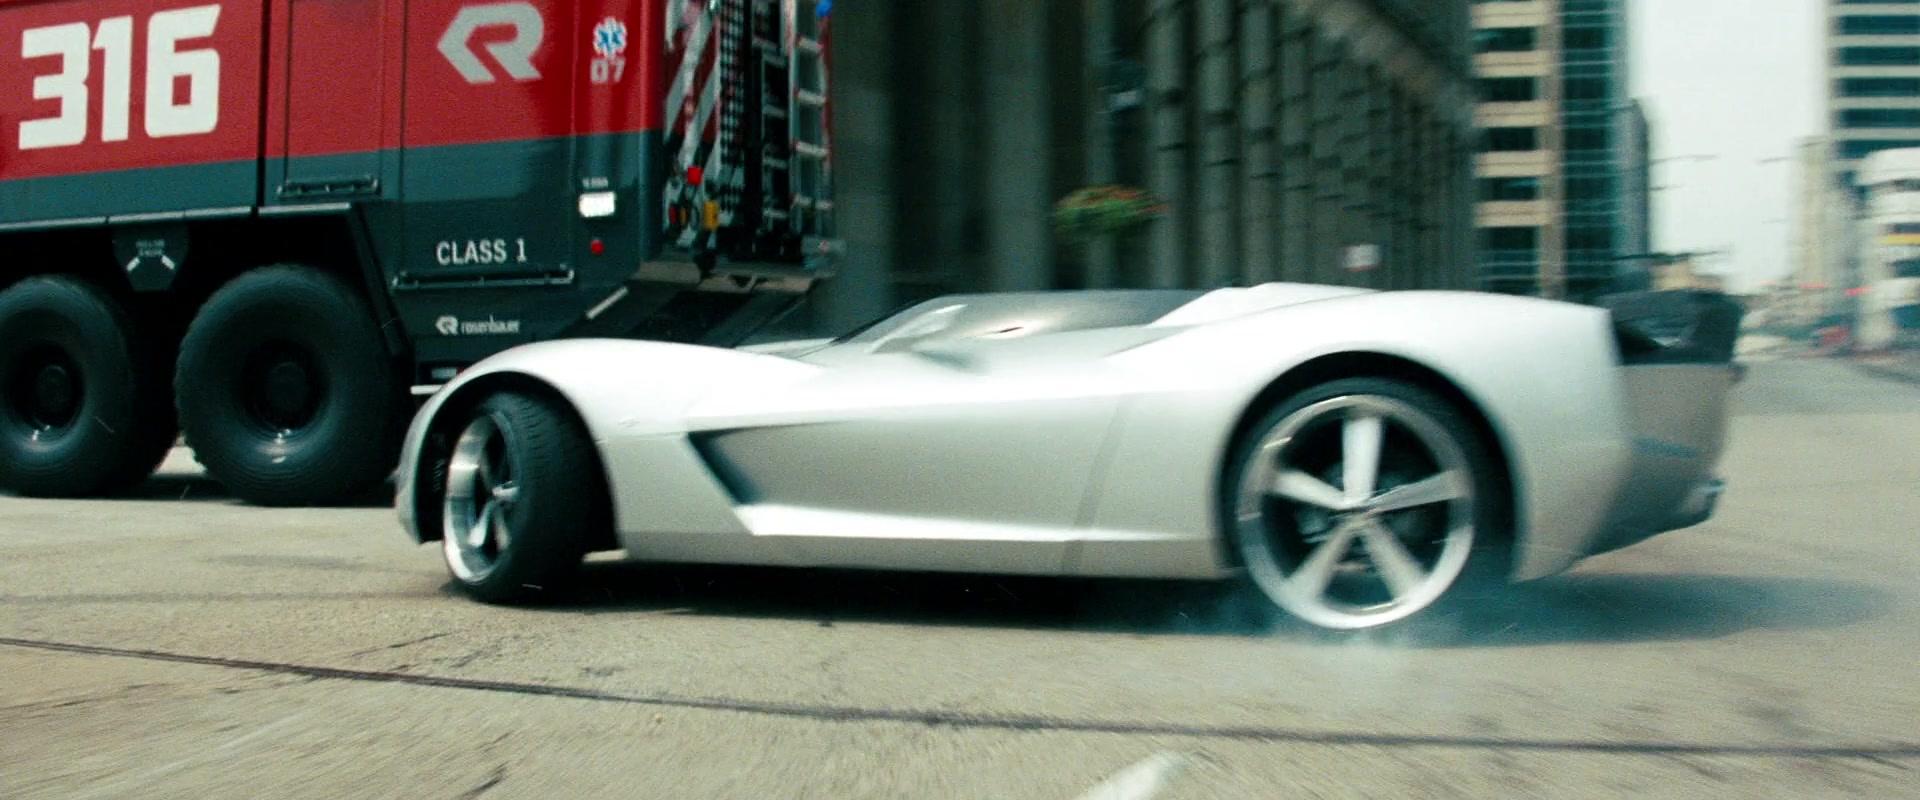 Used Corvette Stingray >> Chevrolet Corvette Stingray Speedster Concept in Transformers: Dark of the Moon (2011) Movie